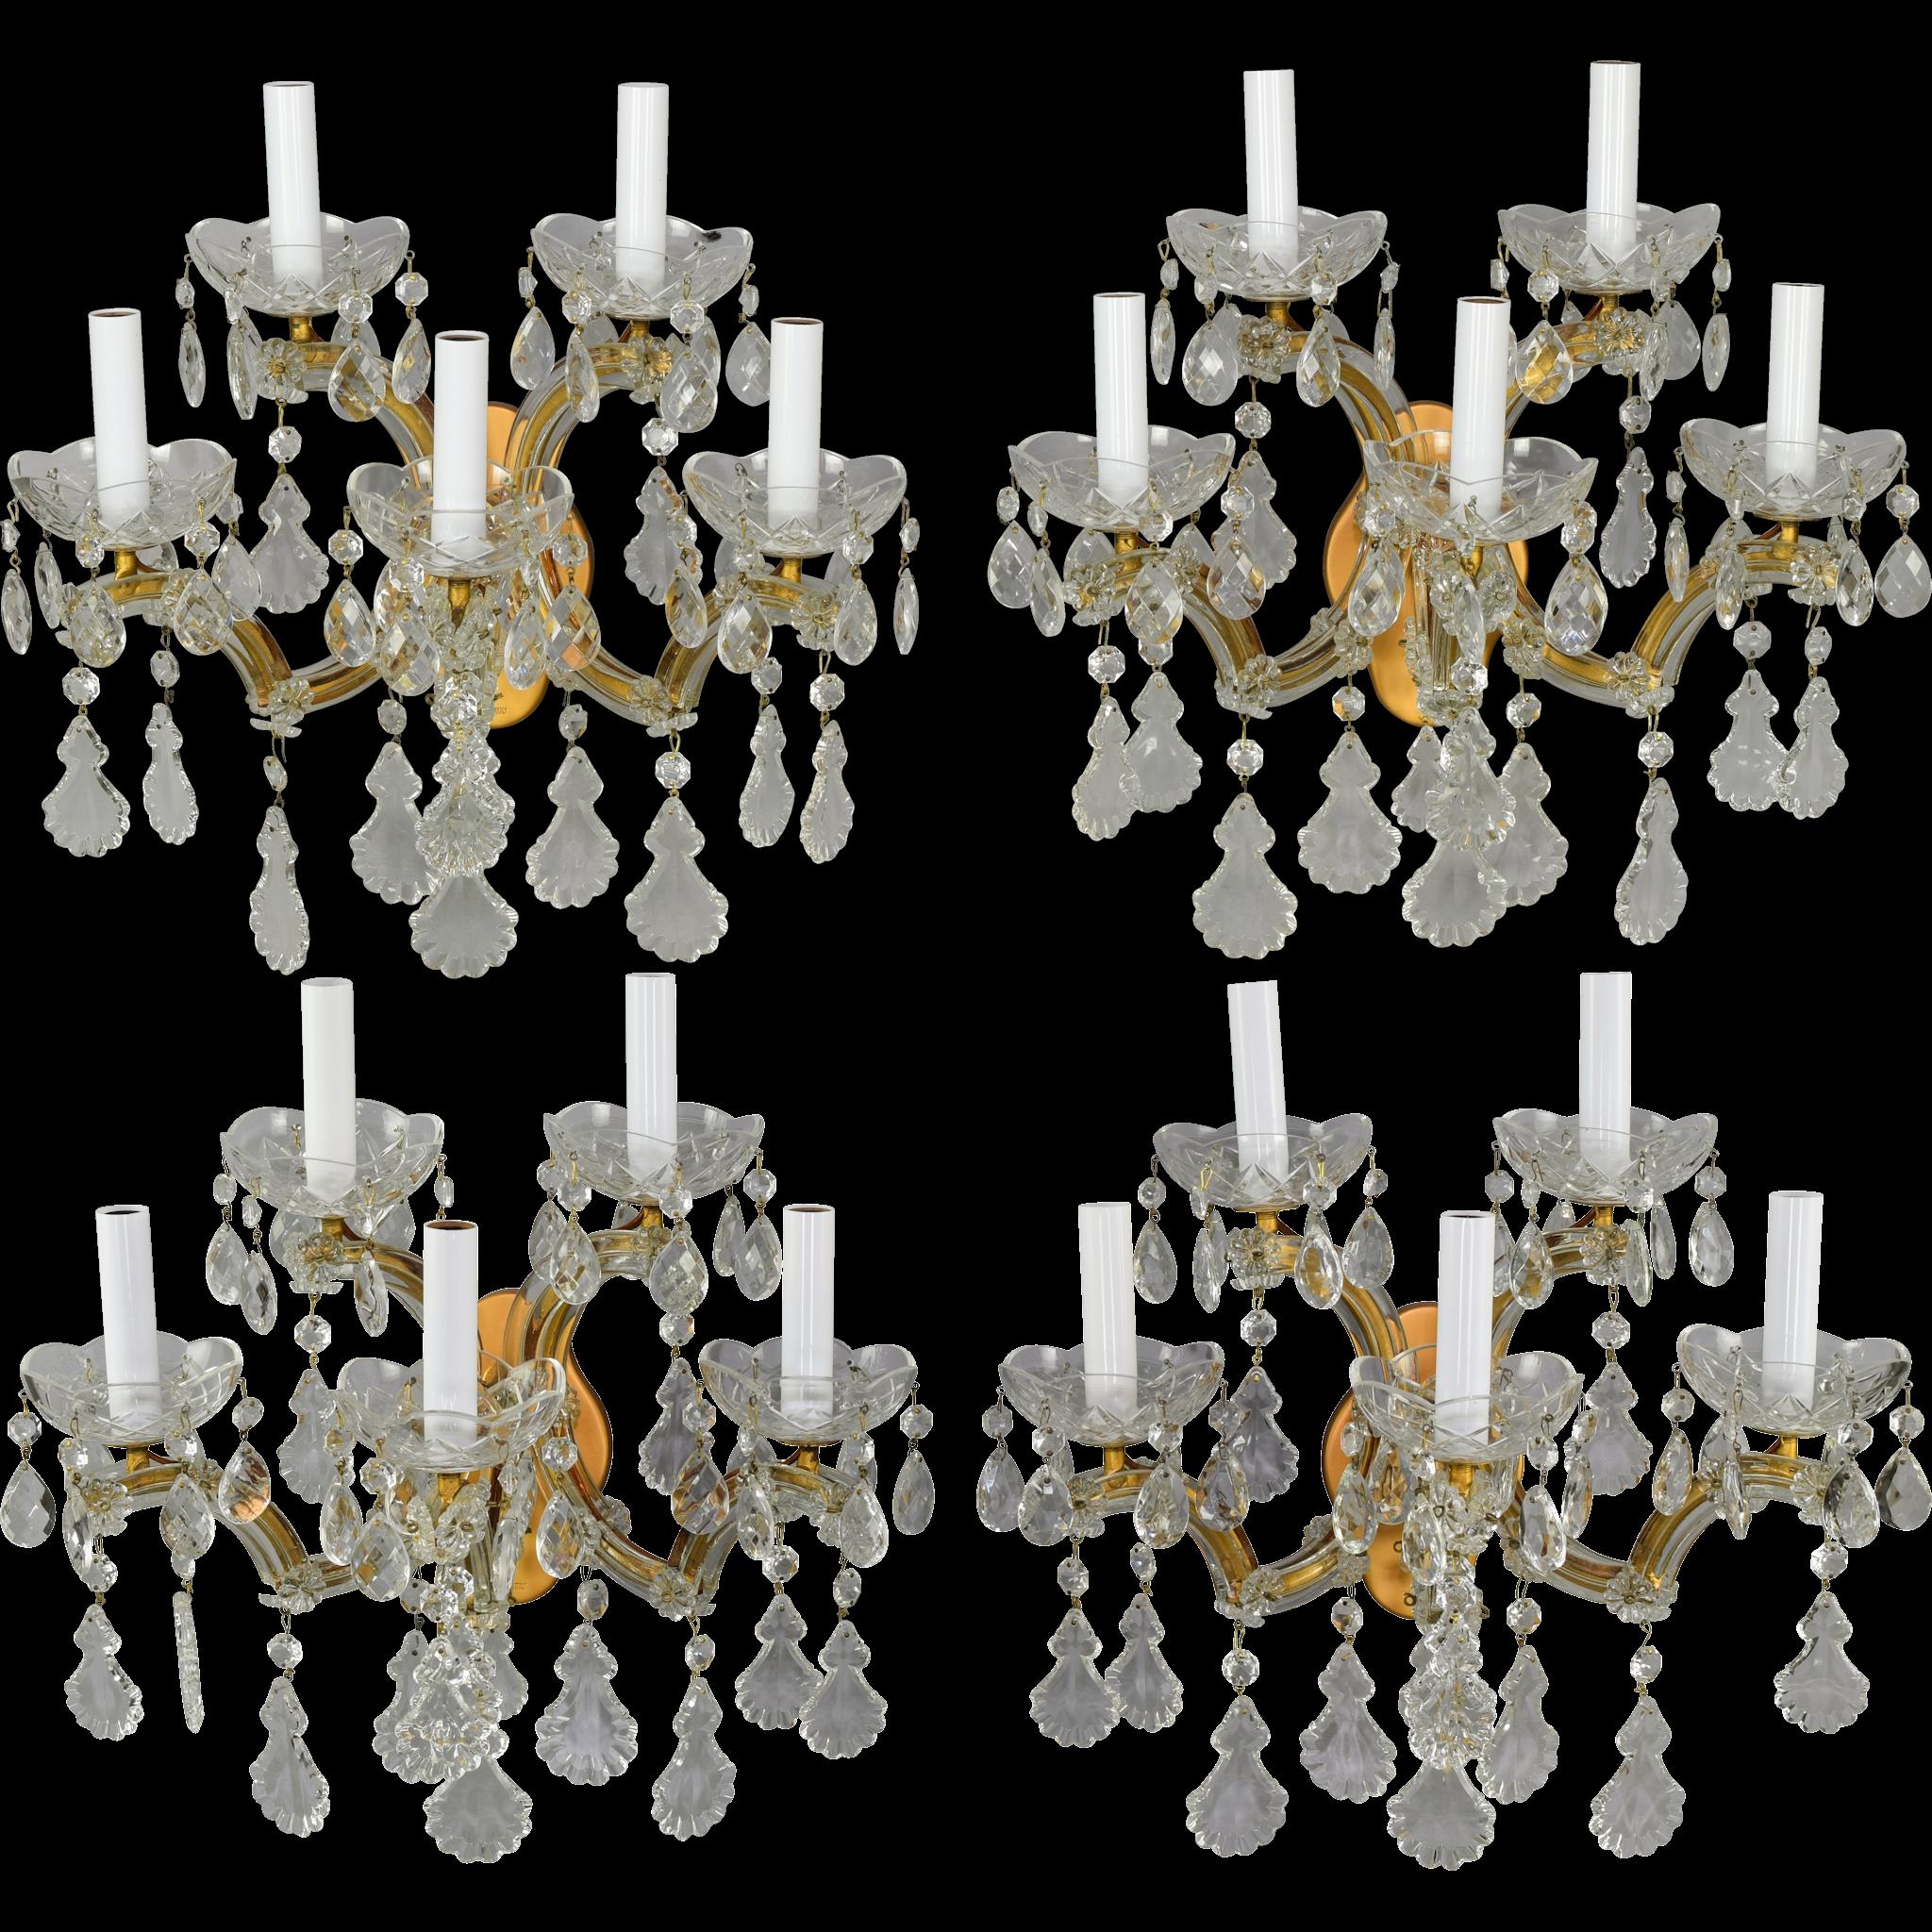 Set 4 Vintage Maria Theresa Italian 5 Light Sconces